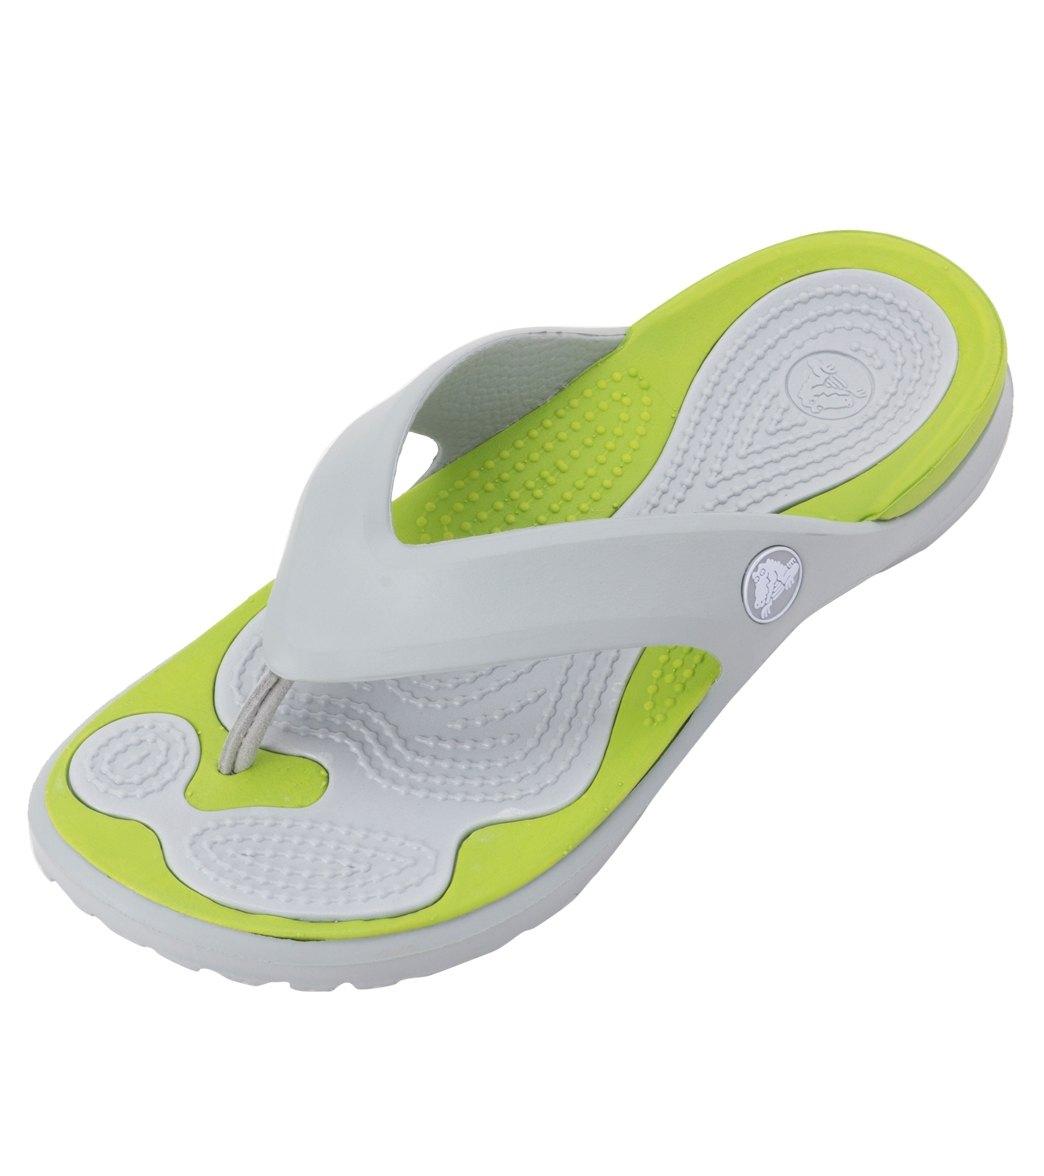 Crocs Mens Flip Flops | Crocs Unisex Flip Flops | Crocs Modi Flip Flop